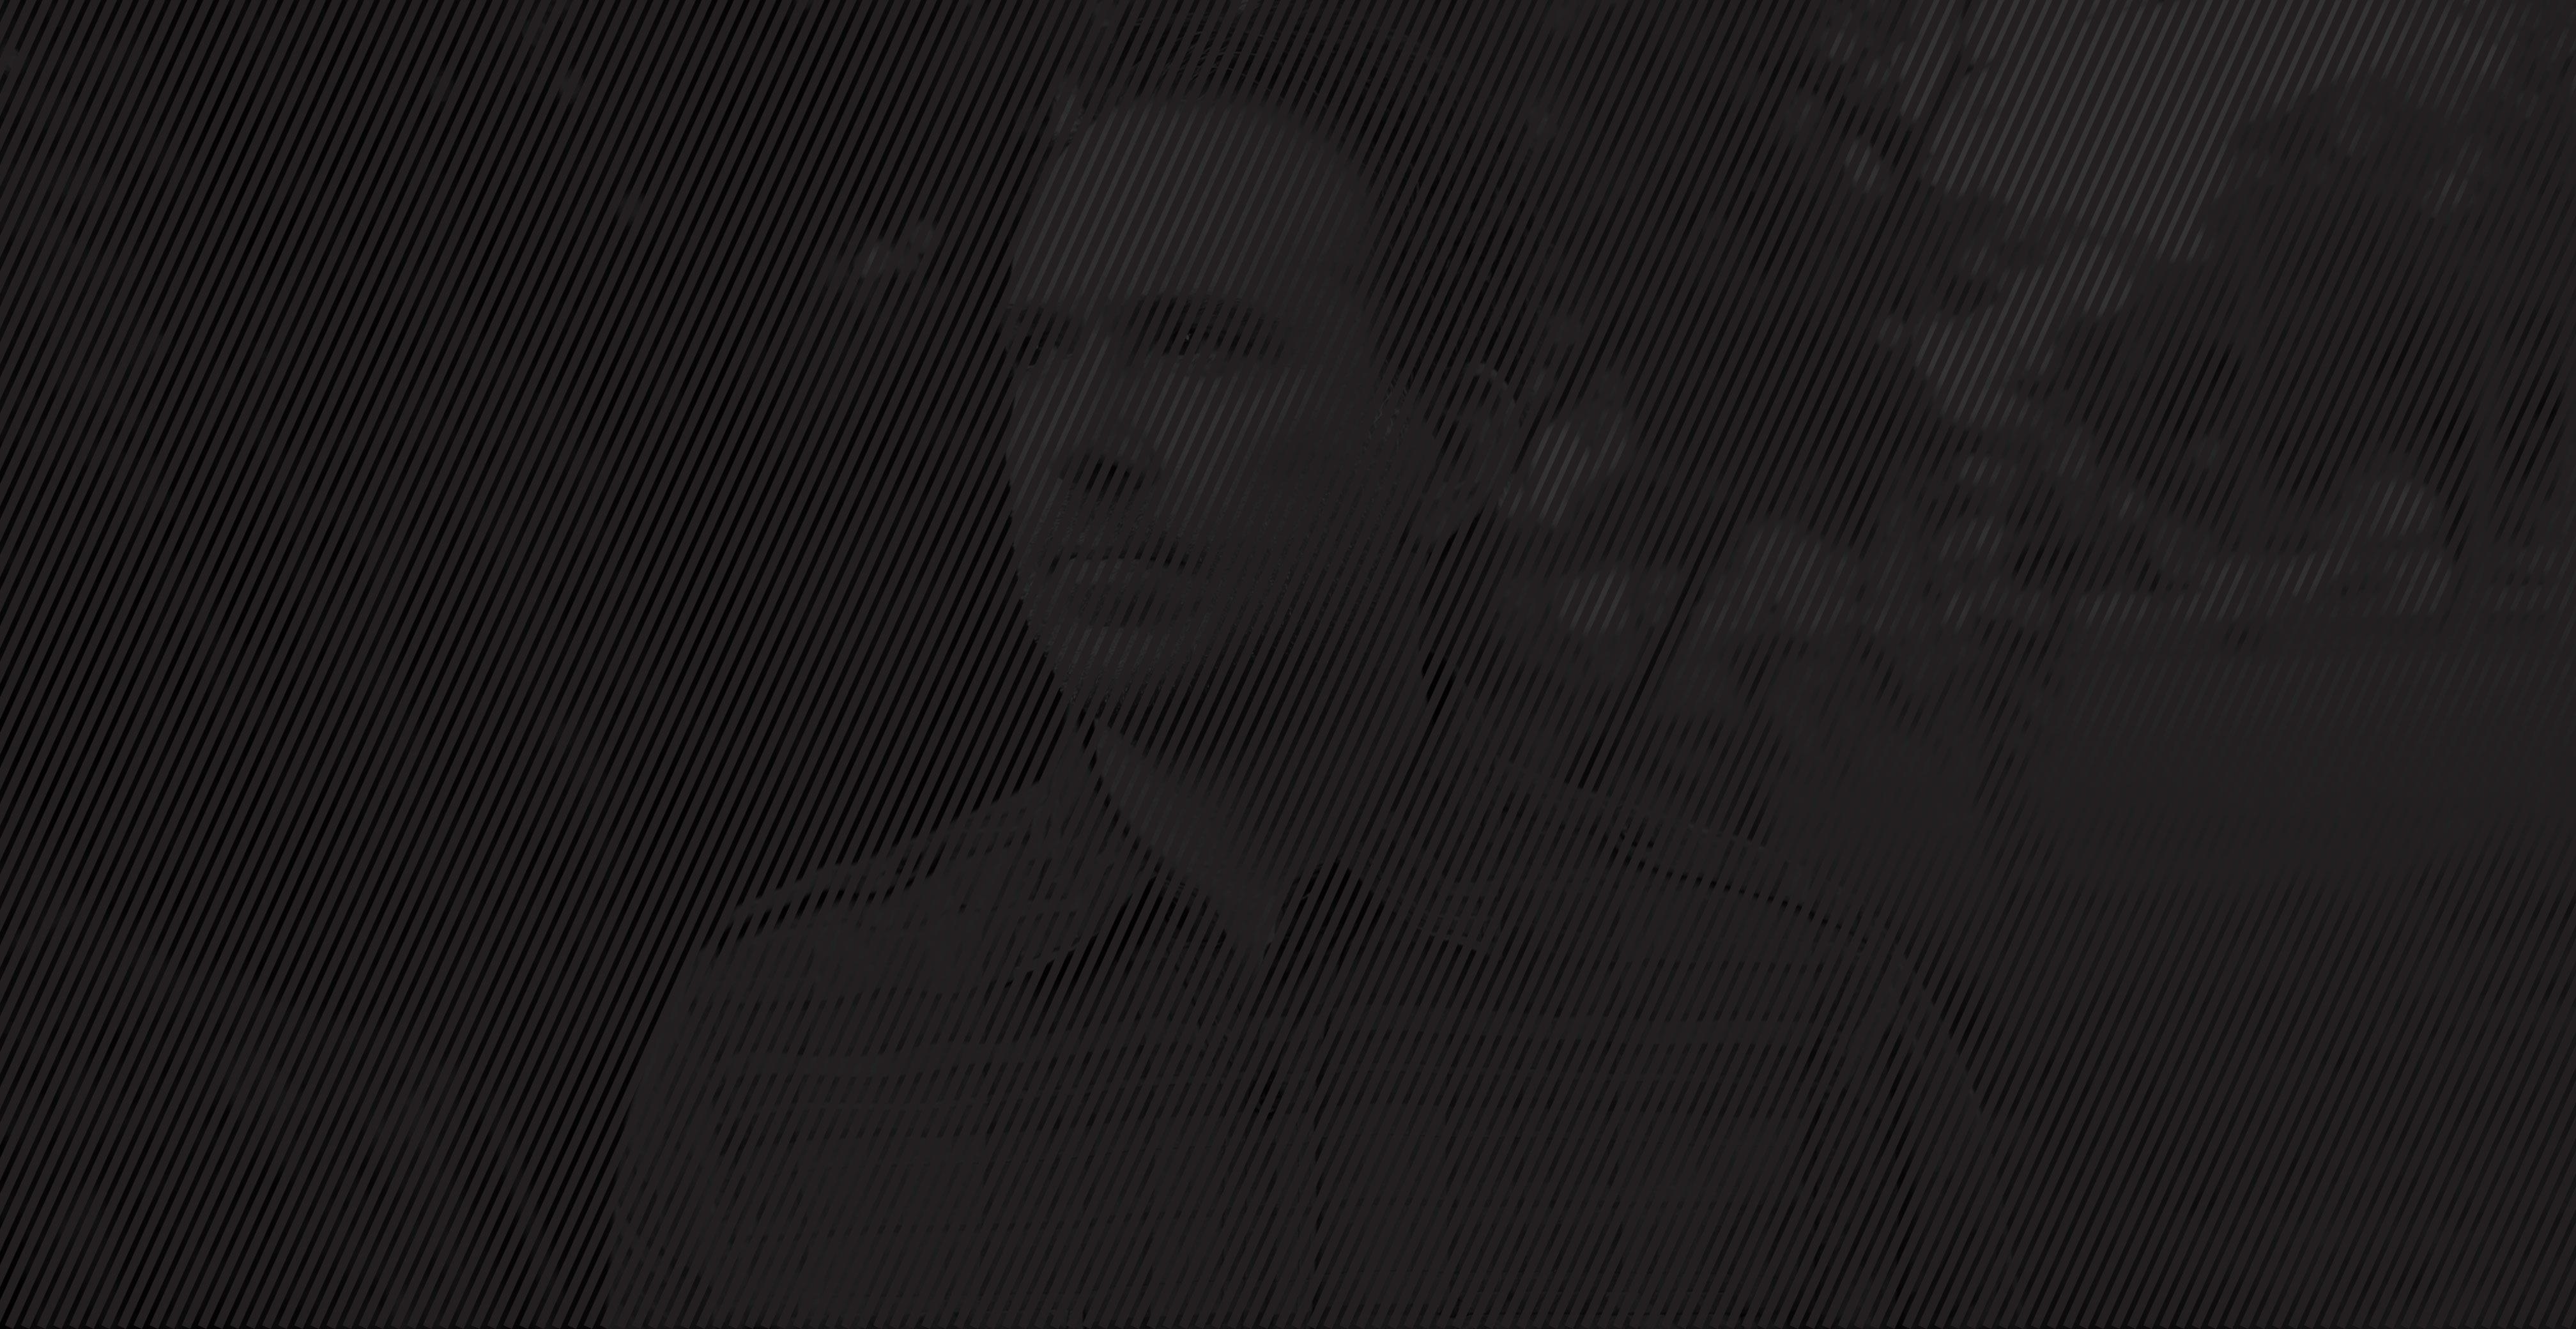 SEAN HARTMAN // CREATIVE & BRAND STRATEGY